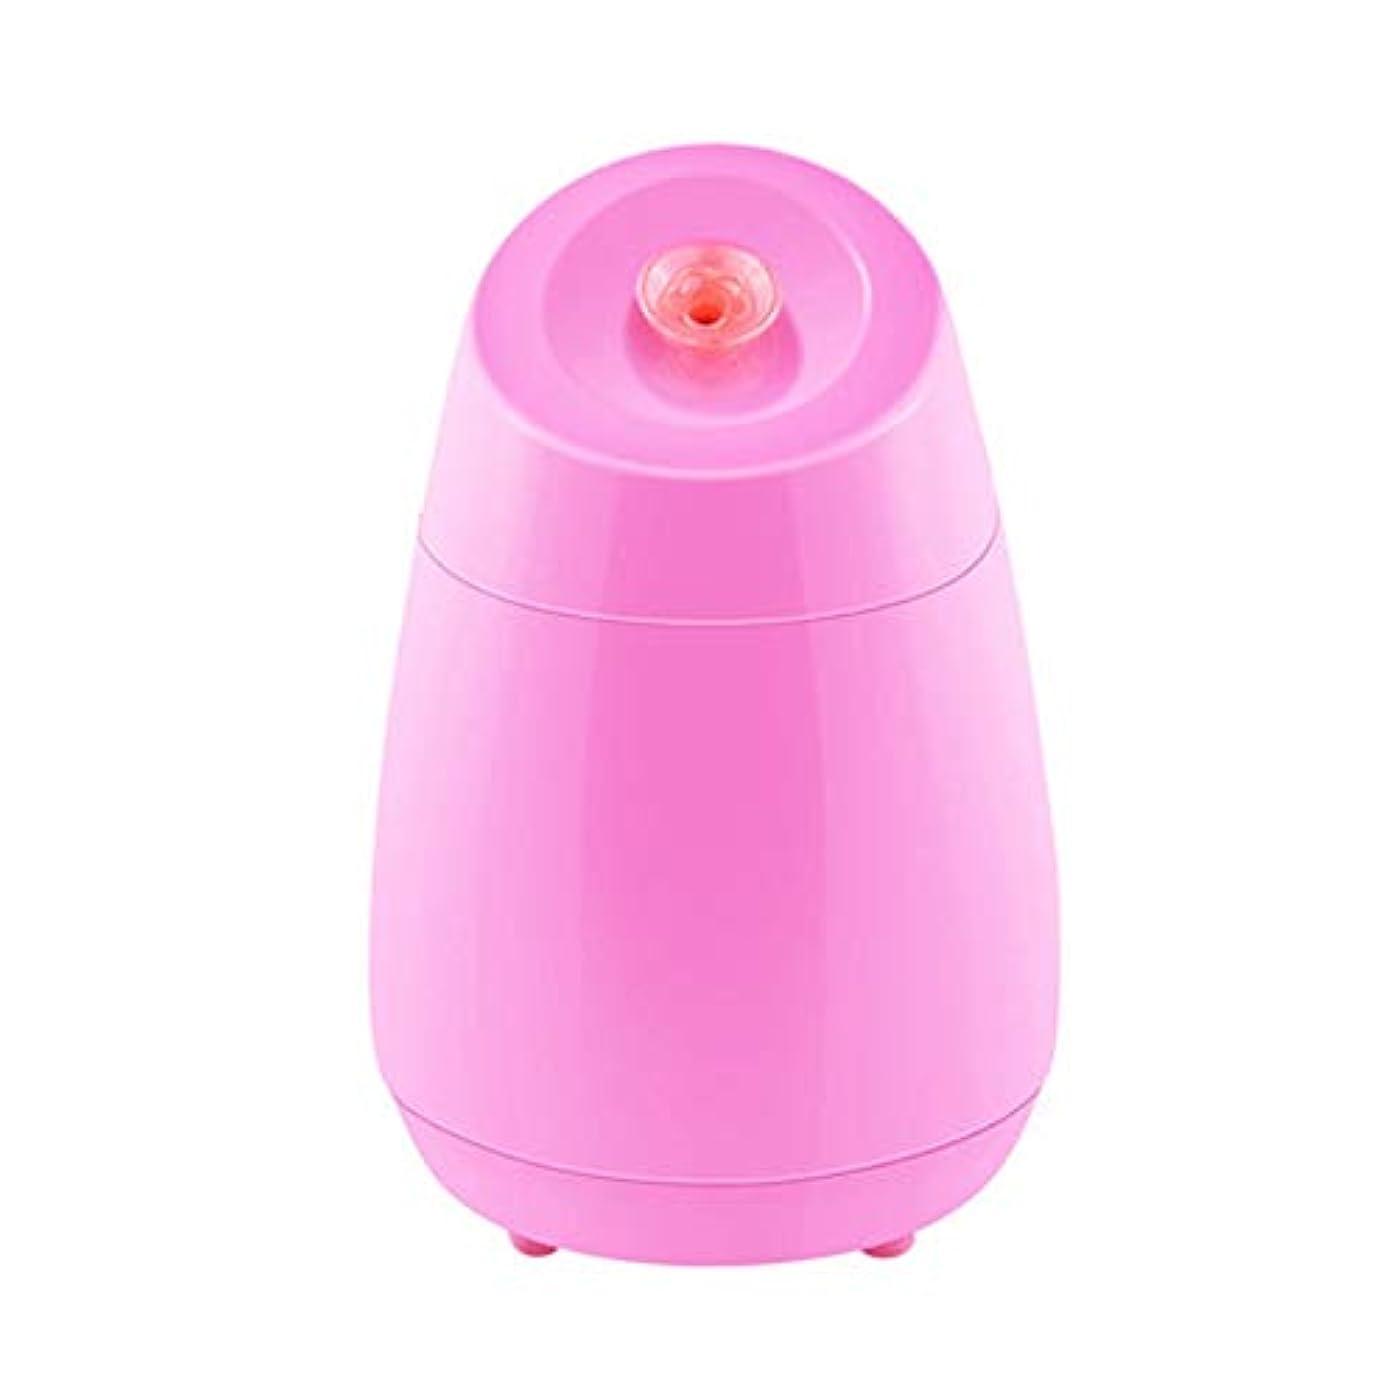 ZXF ナノスプレー水道メーター美容機器ABS材料ホットスプレーフルーツと野菜の蒸し顔ホームフェイシャルフェイシャルフェイスブルーセクションピンク 滑らかである (色 : Pink)